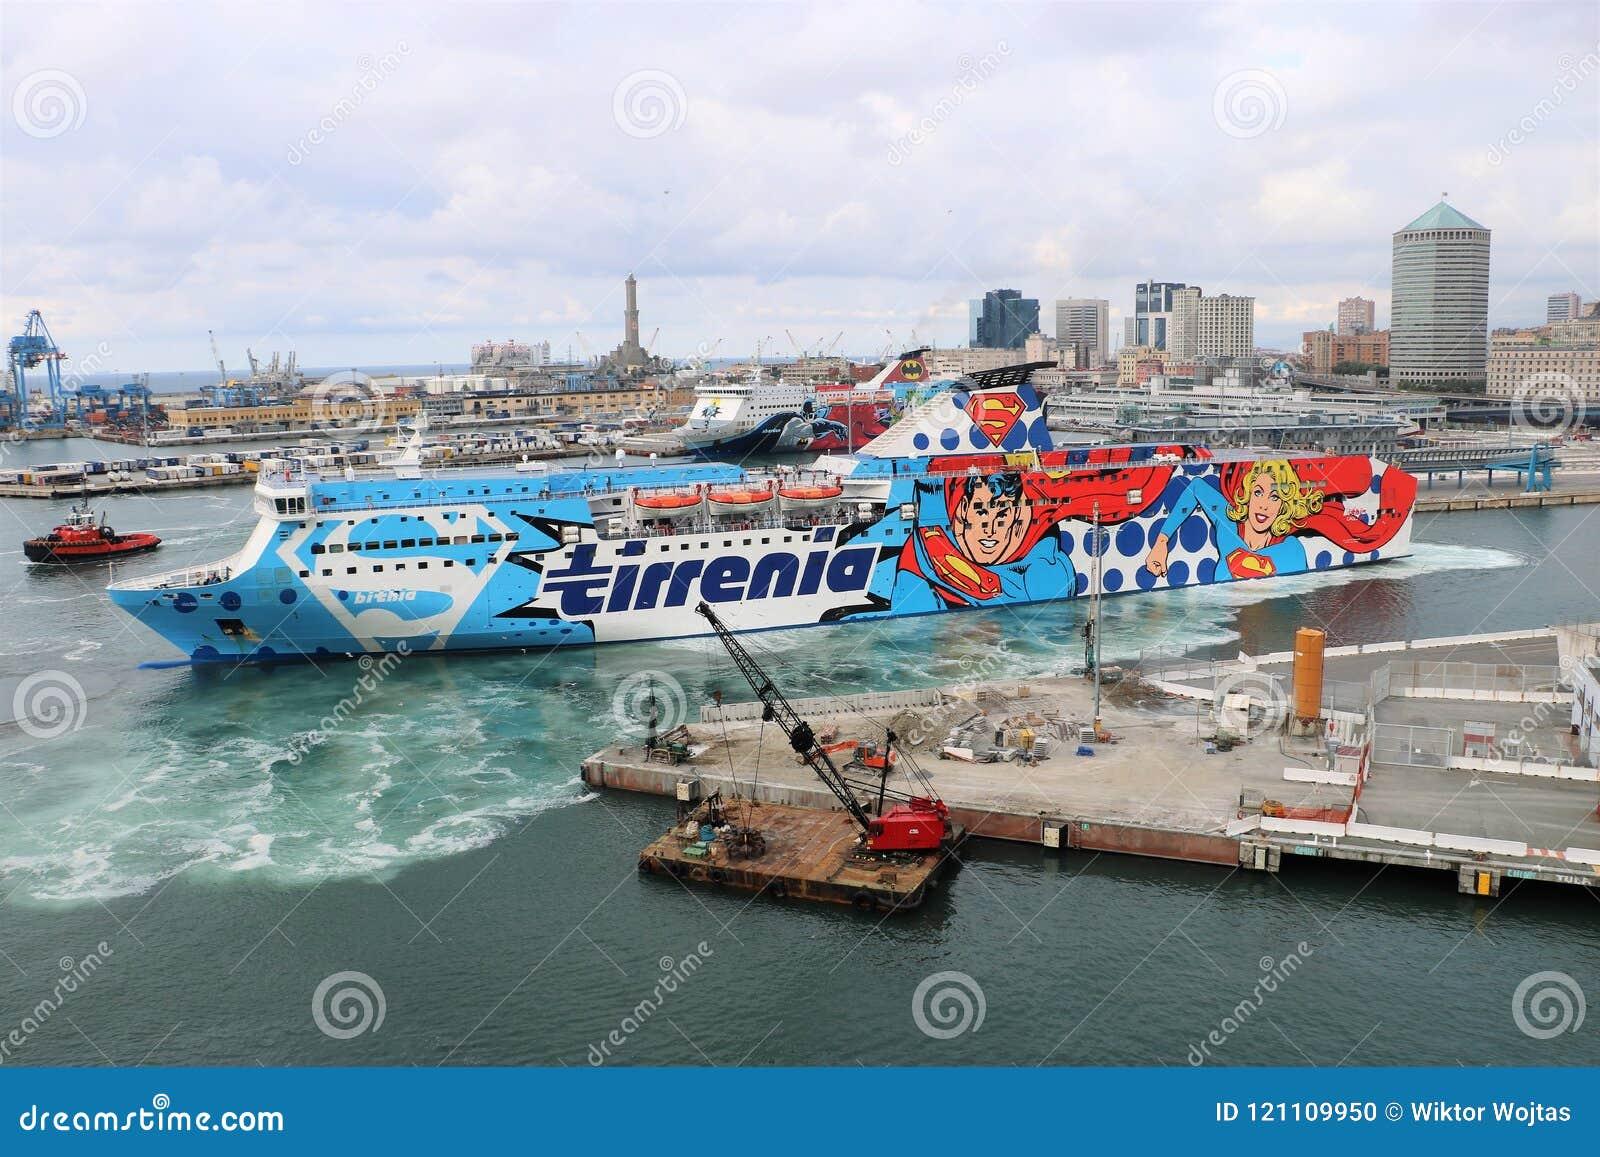 Cruise Ship Tirrenia Bithia Editorial Image Image Of Navigazione